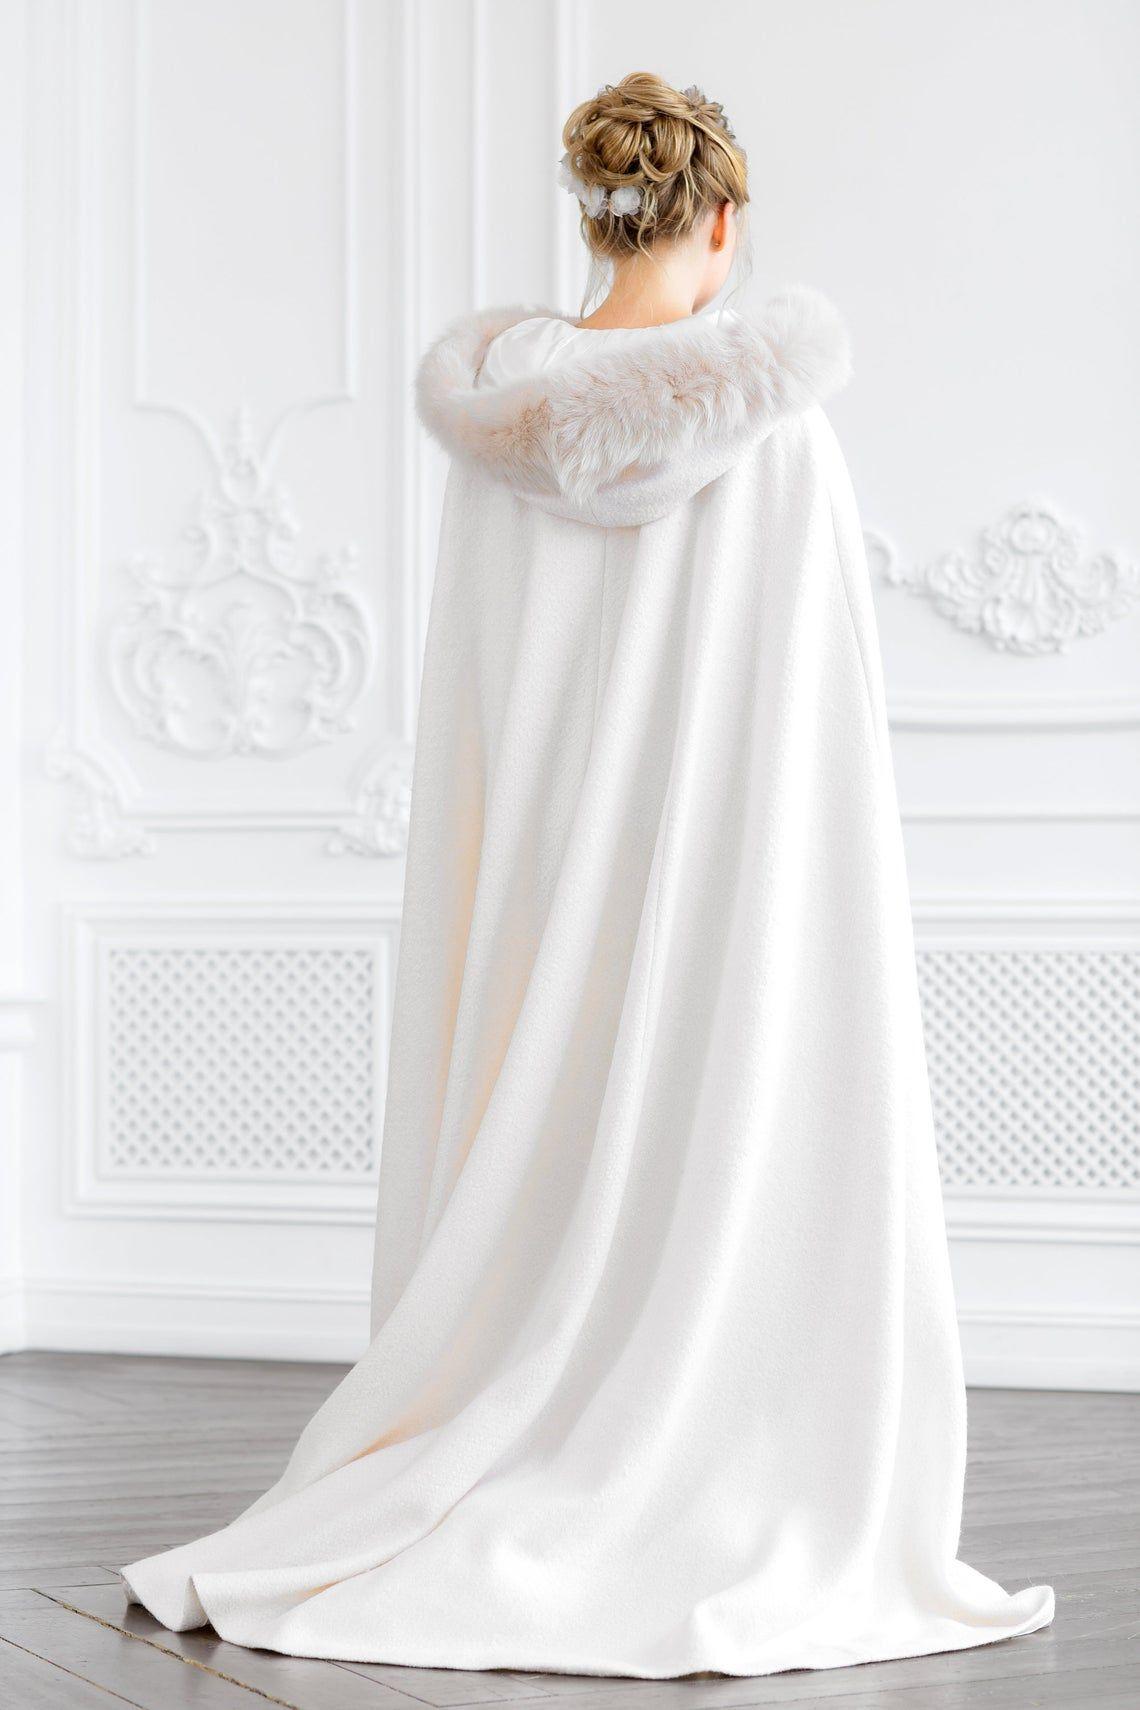 280 in 2020 Bridal coat, Wedding coat